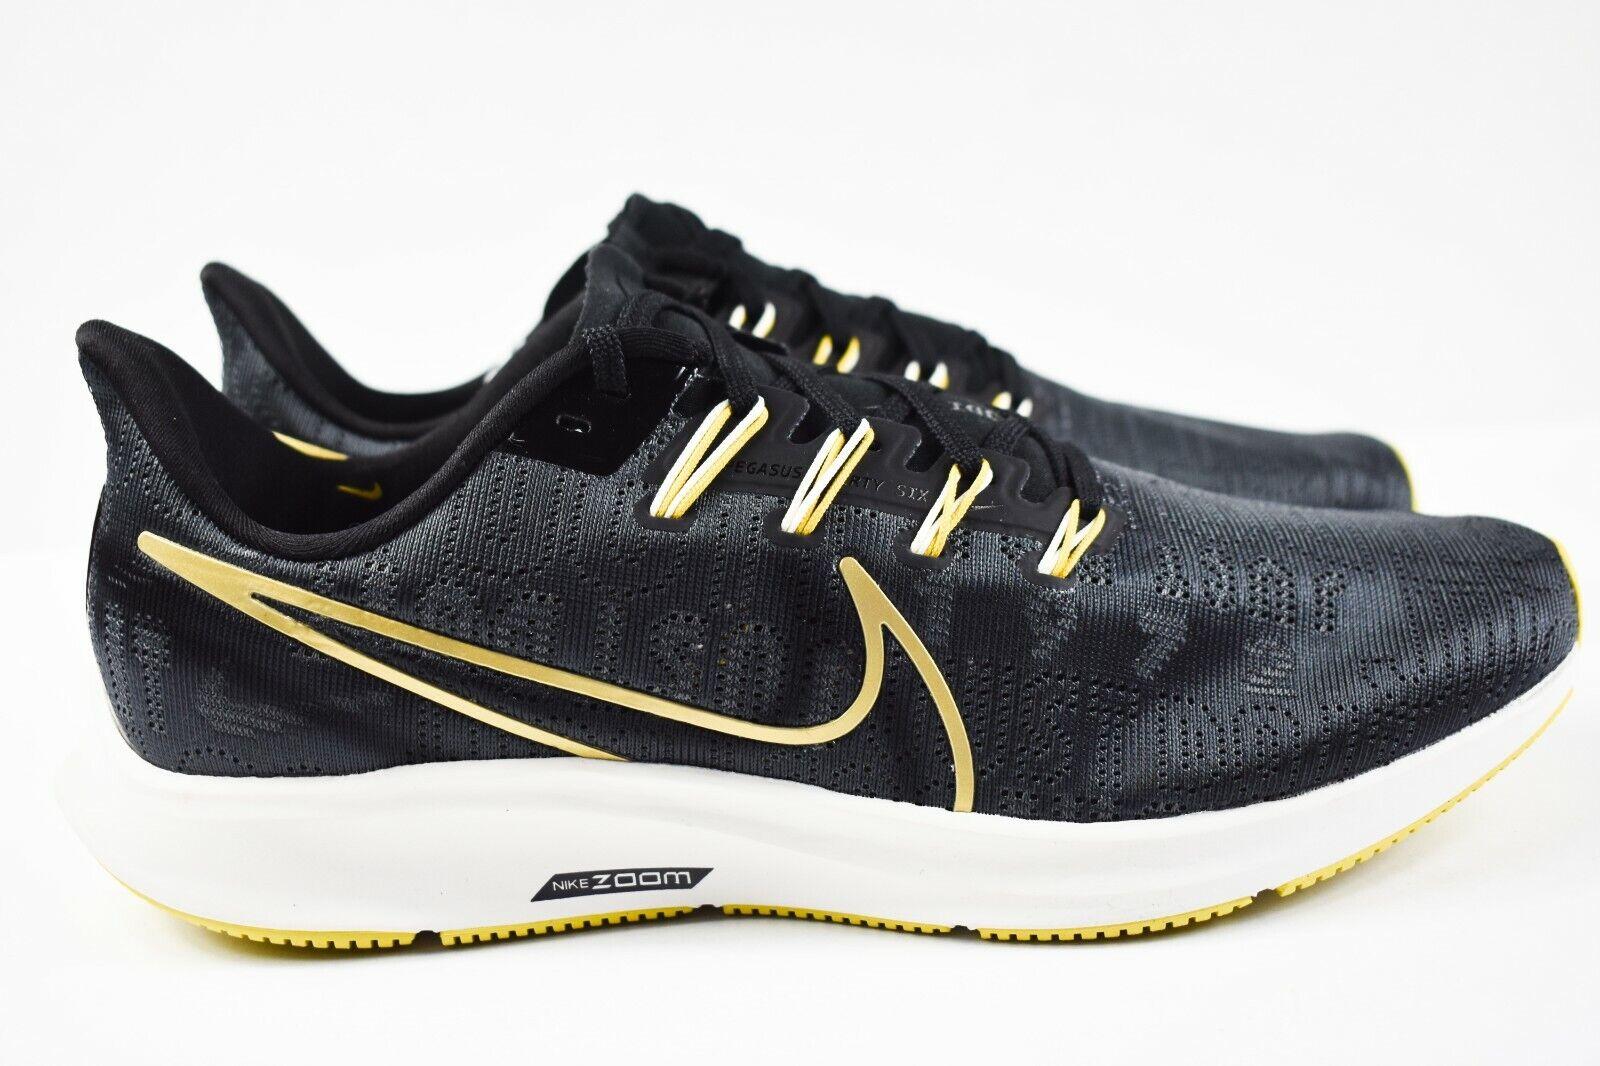 niebla Desagradable malicioso  Nike Mens Air Pegasus Racer PRM Premium Shoes 724270-223 Sz 10 Mahogany for  sale online   eBay